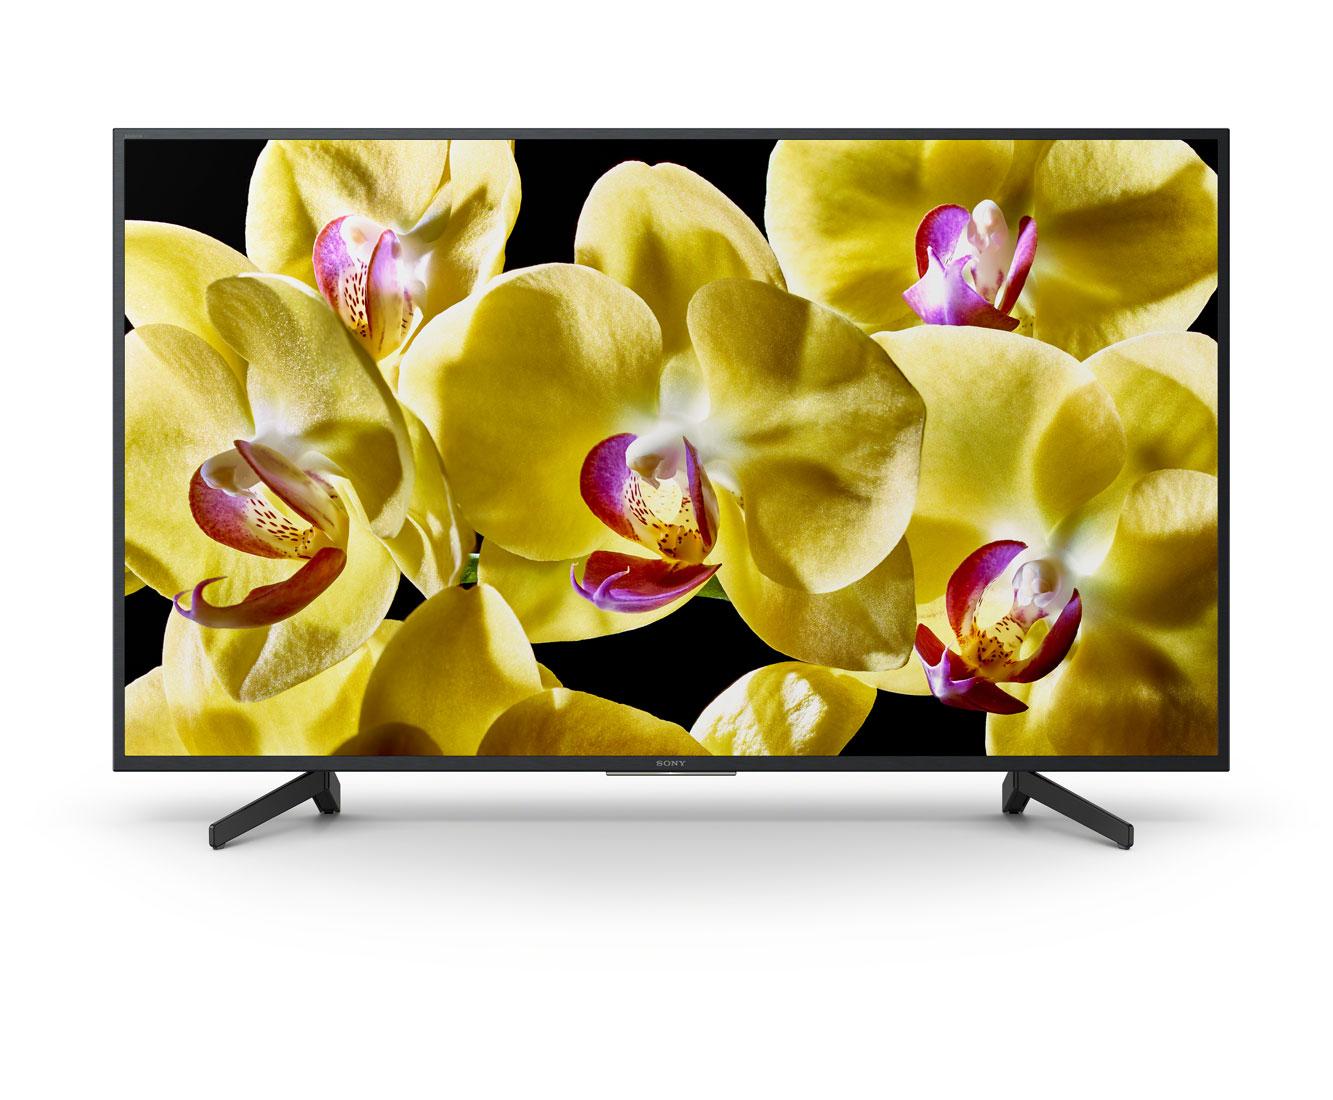 Sony KD-65XG8096, LED-Fernseher schwarz, UltraHD, Triple Tuner, HDR, Android